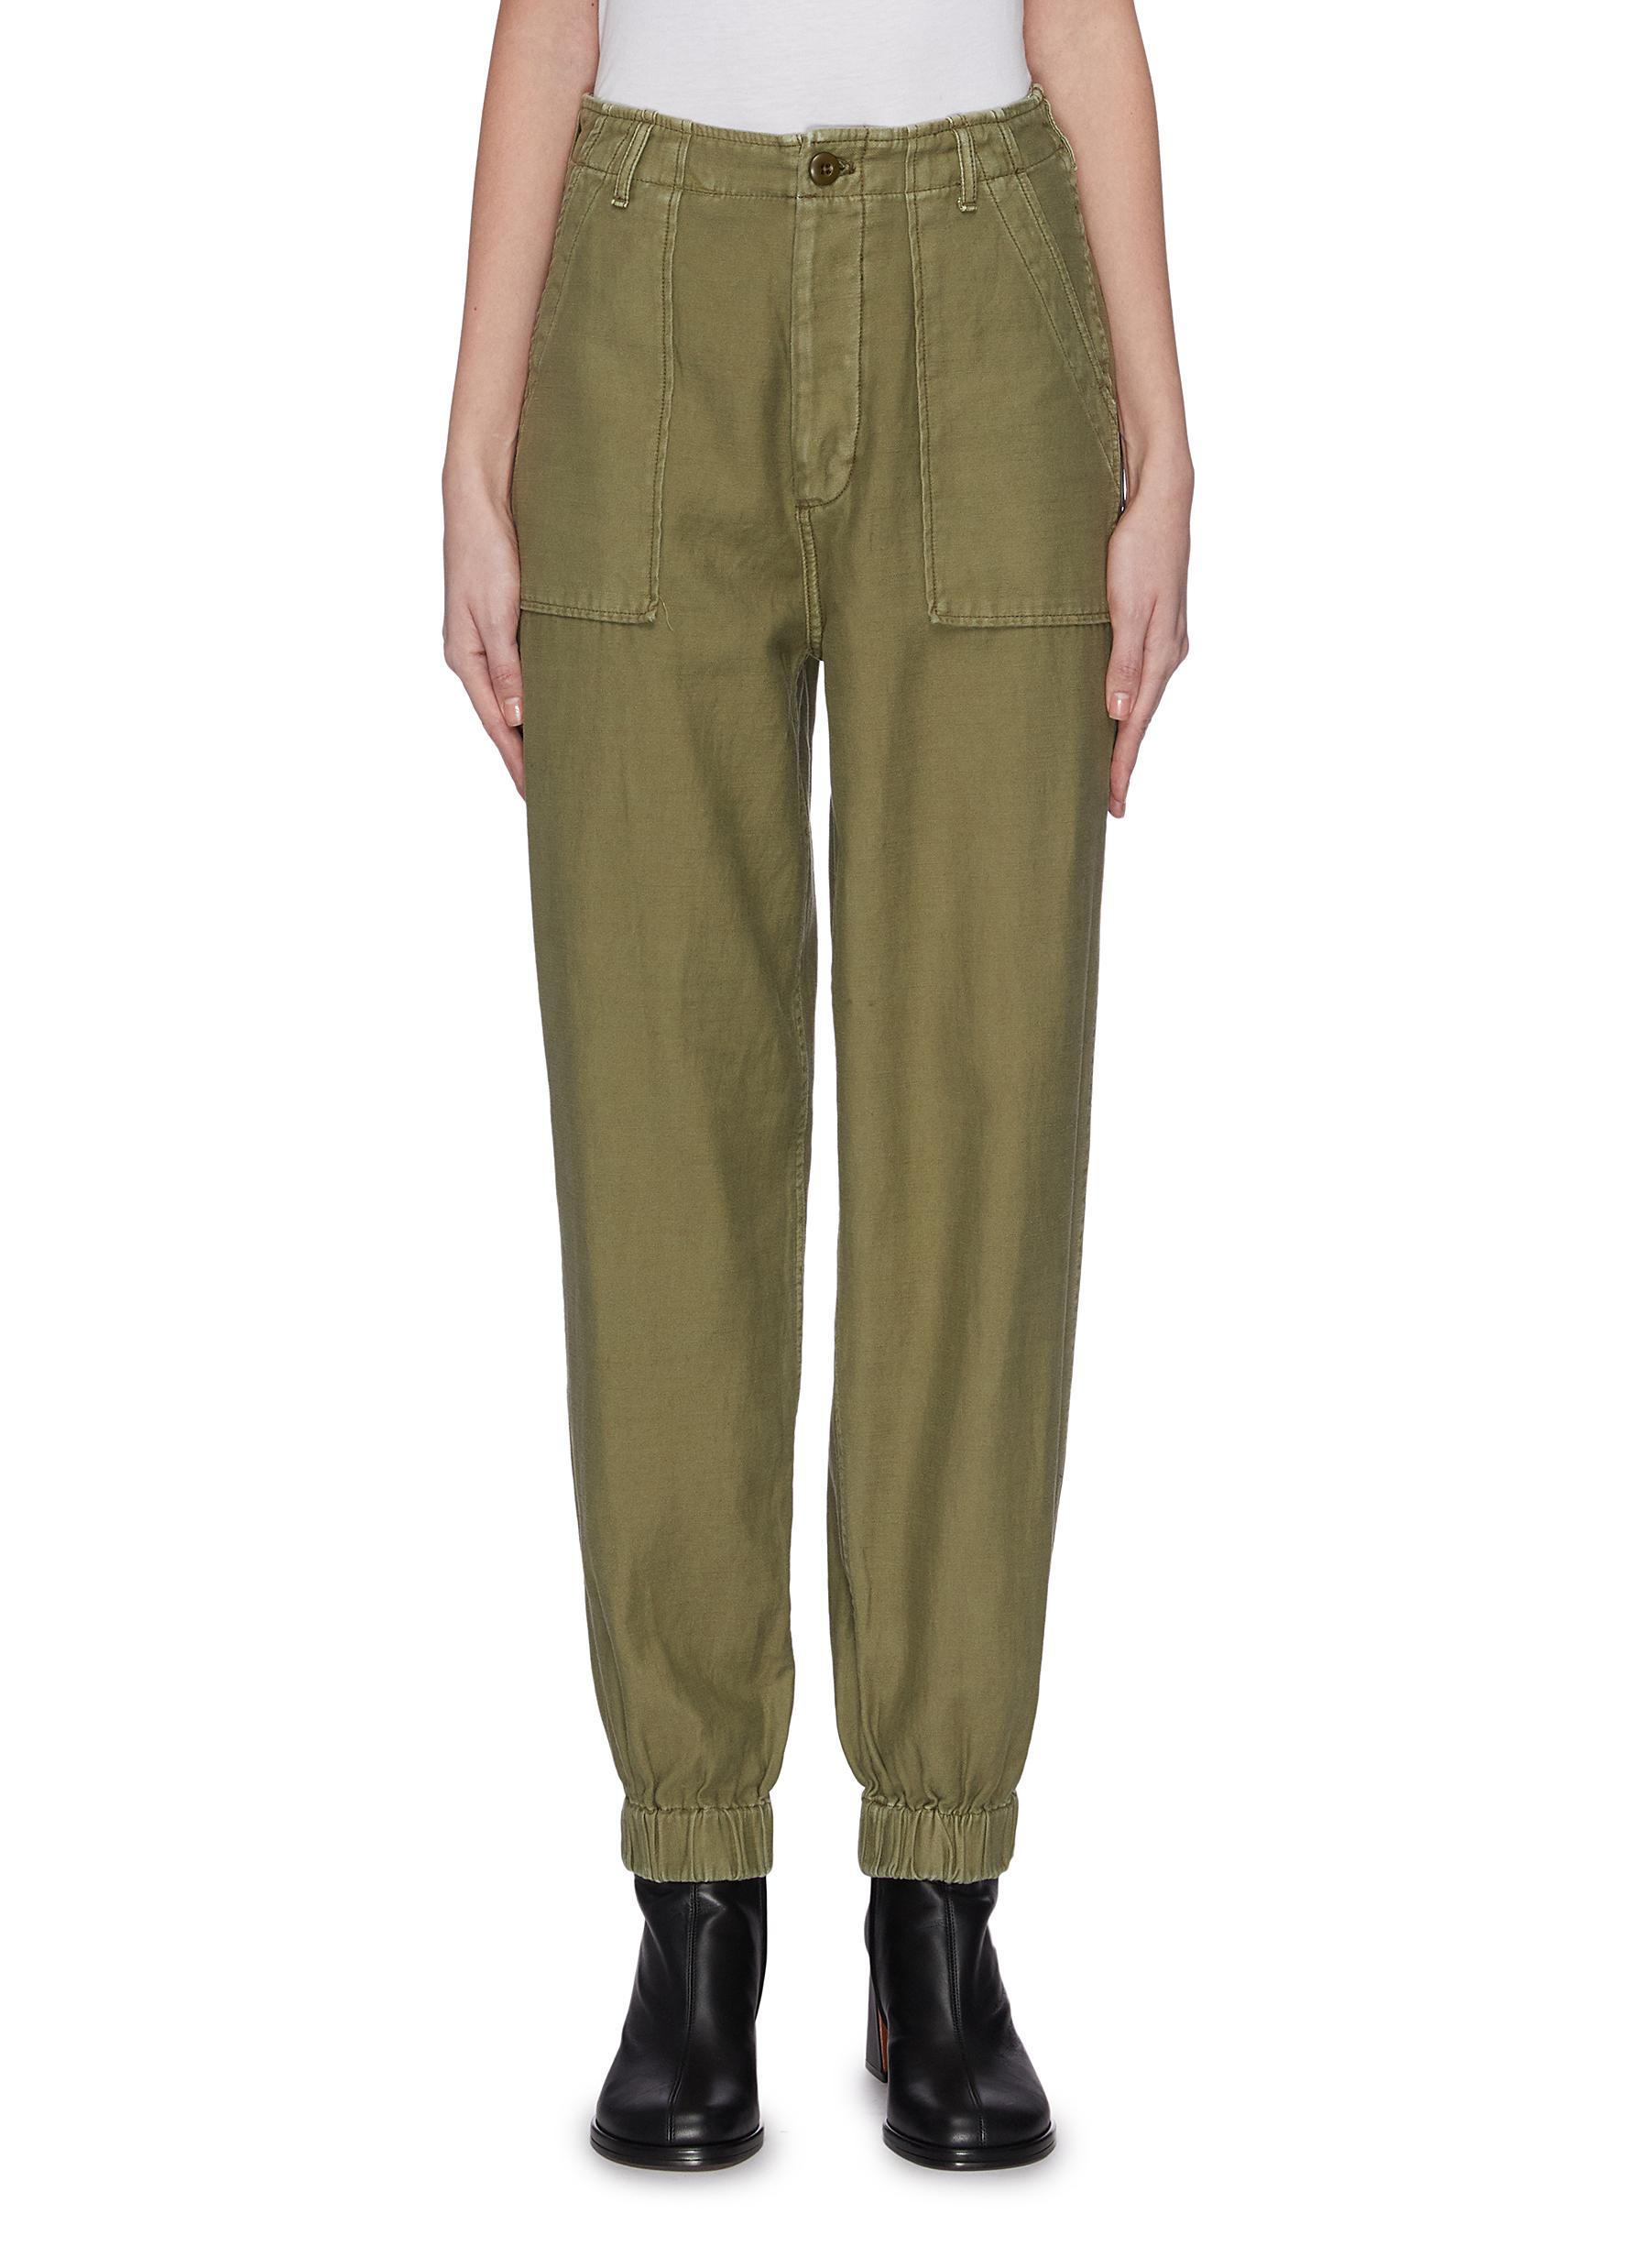 Buy R13 Pants & Shorts Utility jogging pants